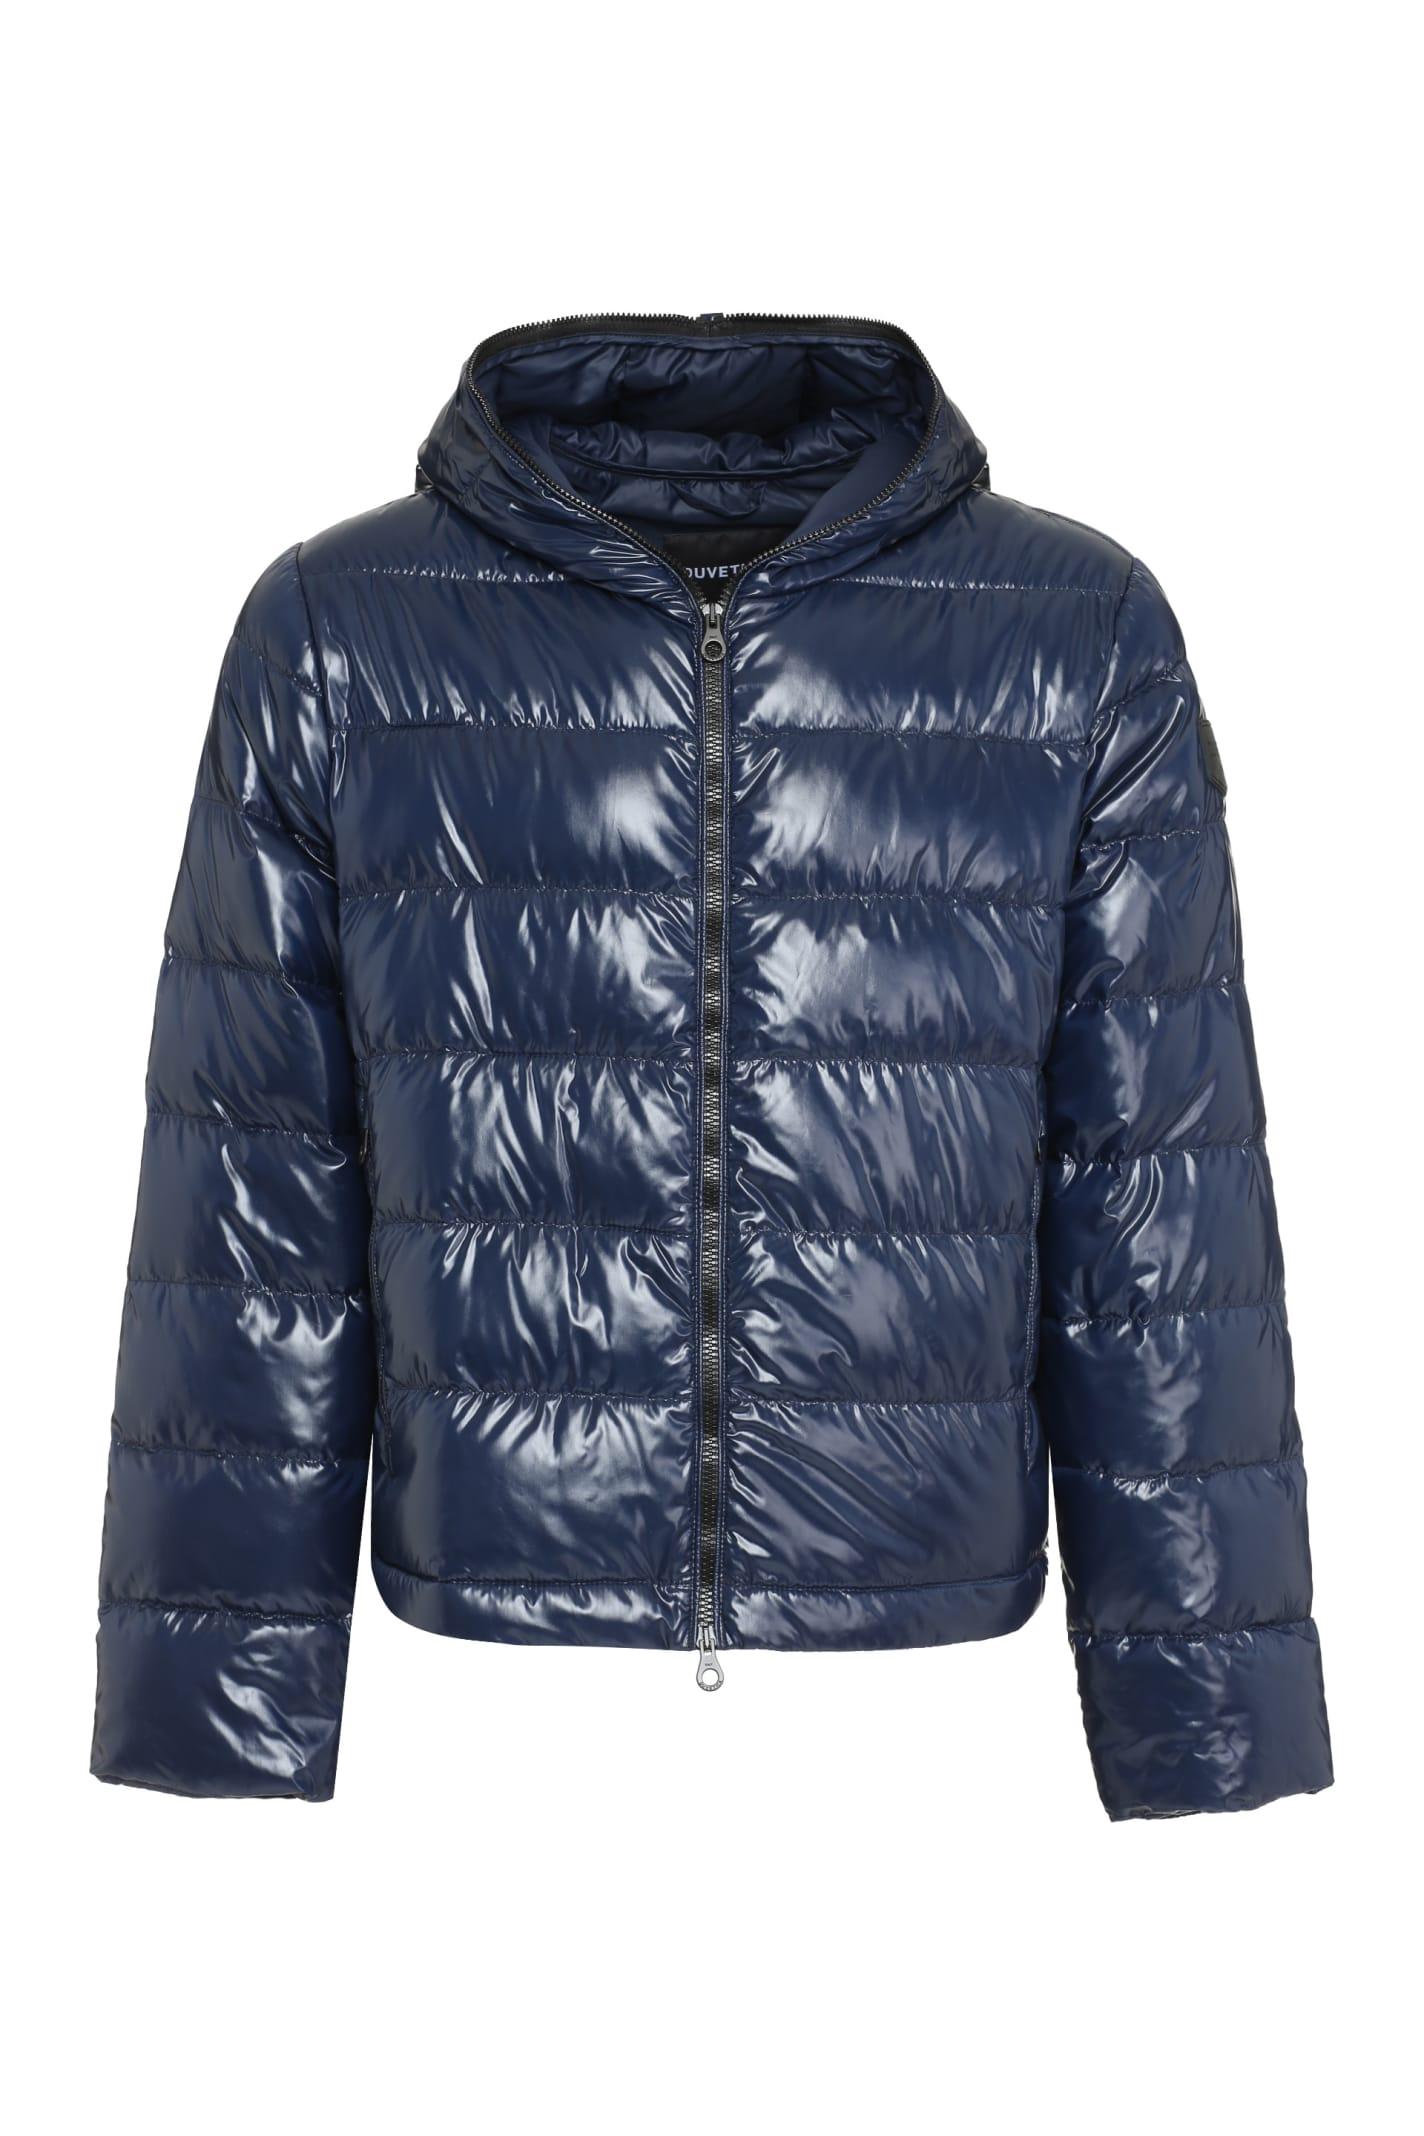 Tolodi Hooded Full-zip Down Jacket